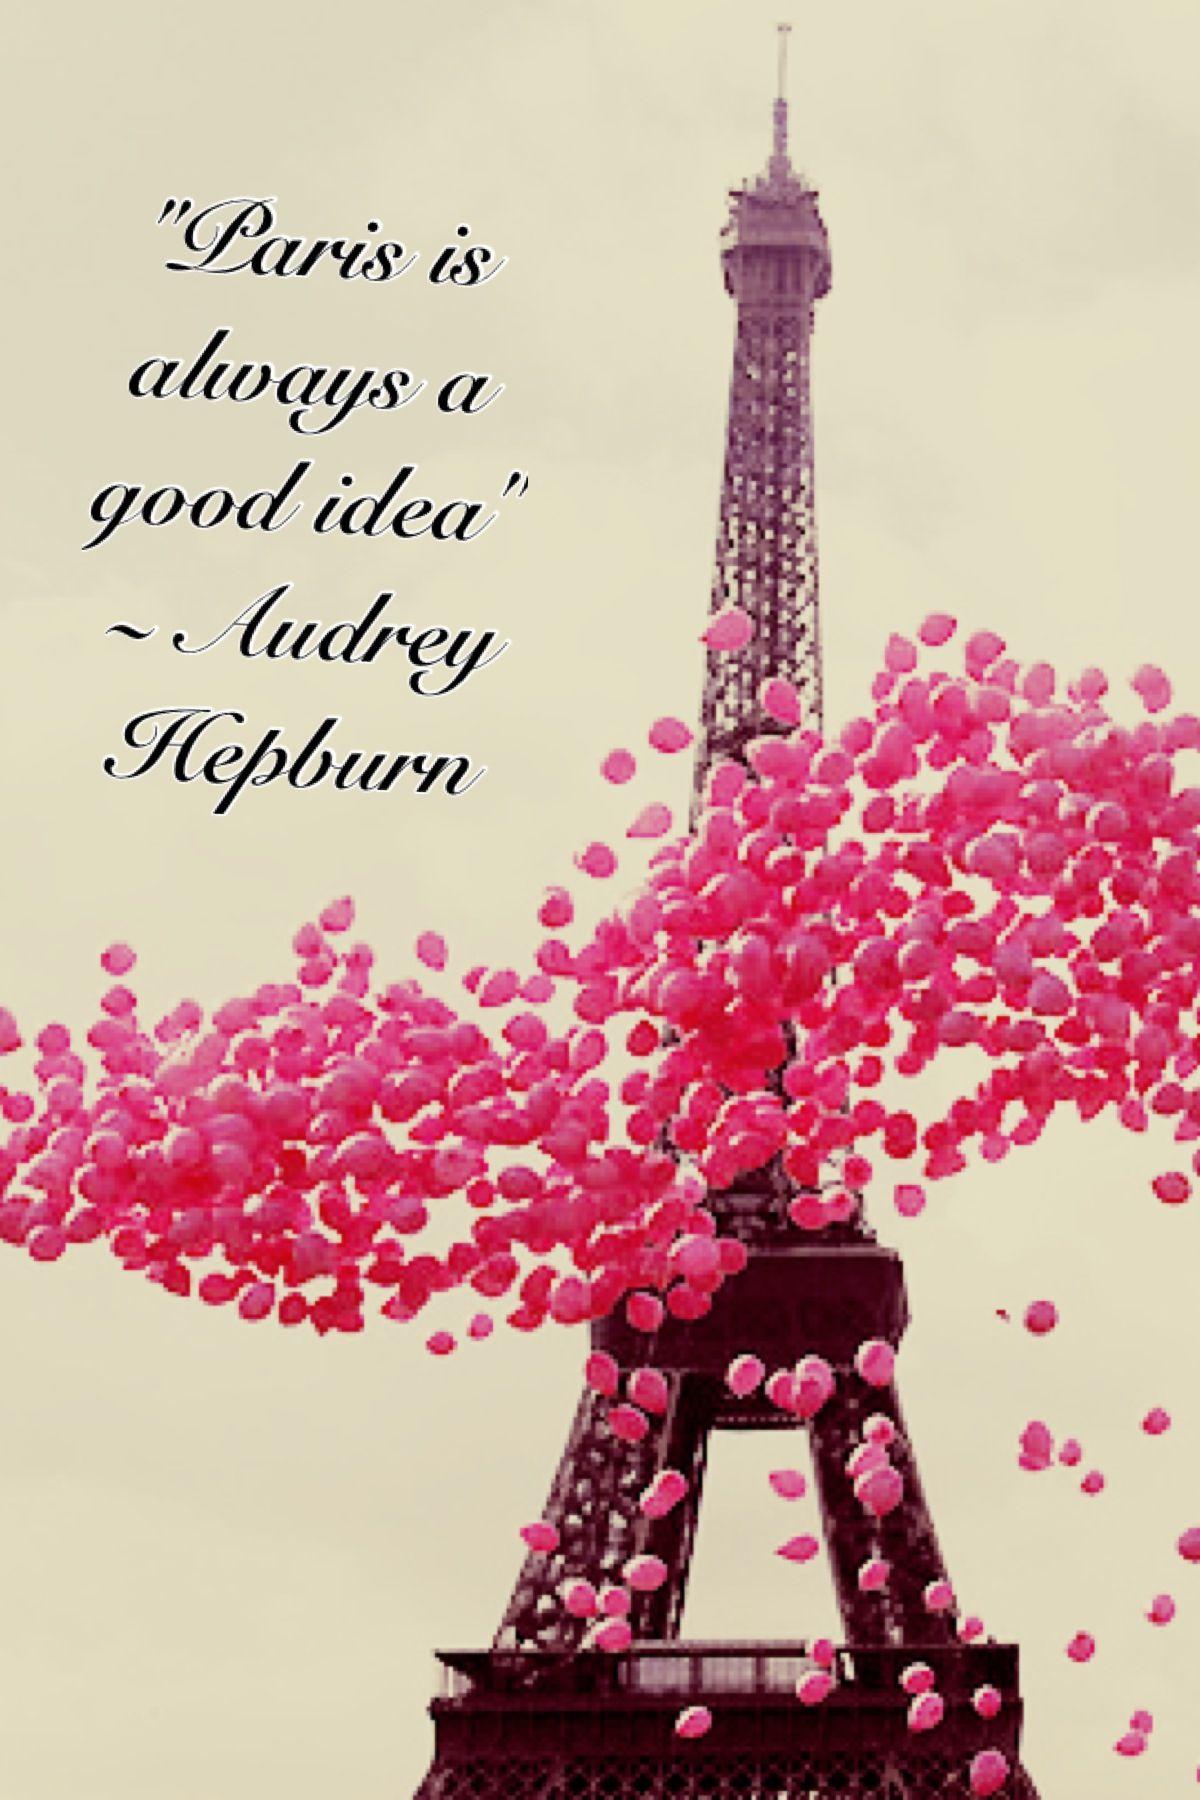 Must see Wallpaper High Quality Paris - 64138553ee5269b29217876576e6f2b0  Image_521171.jpg